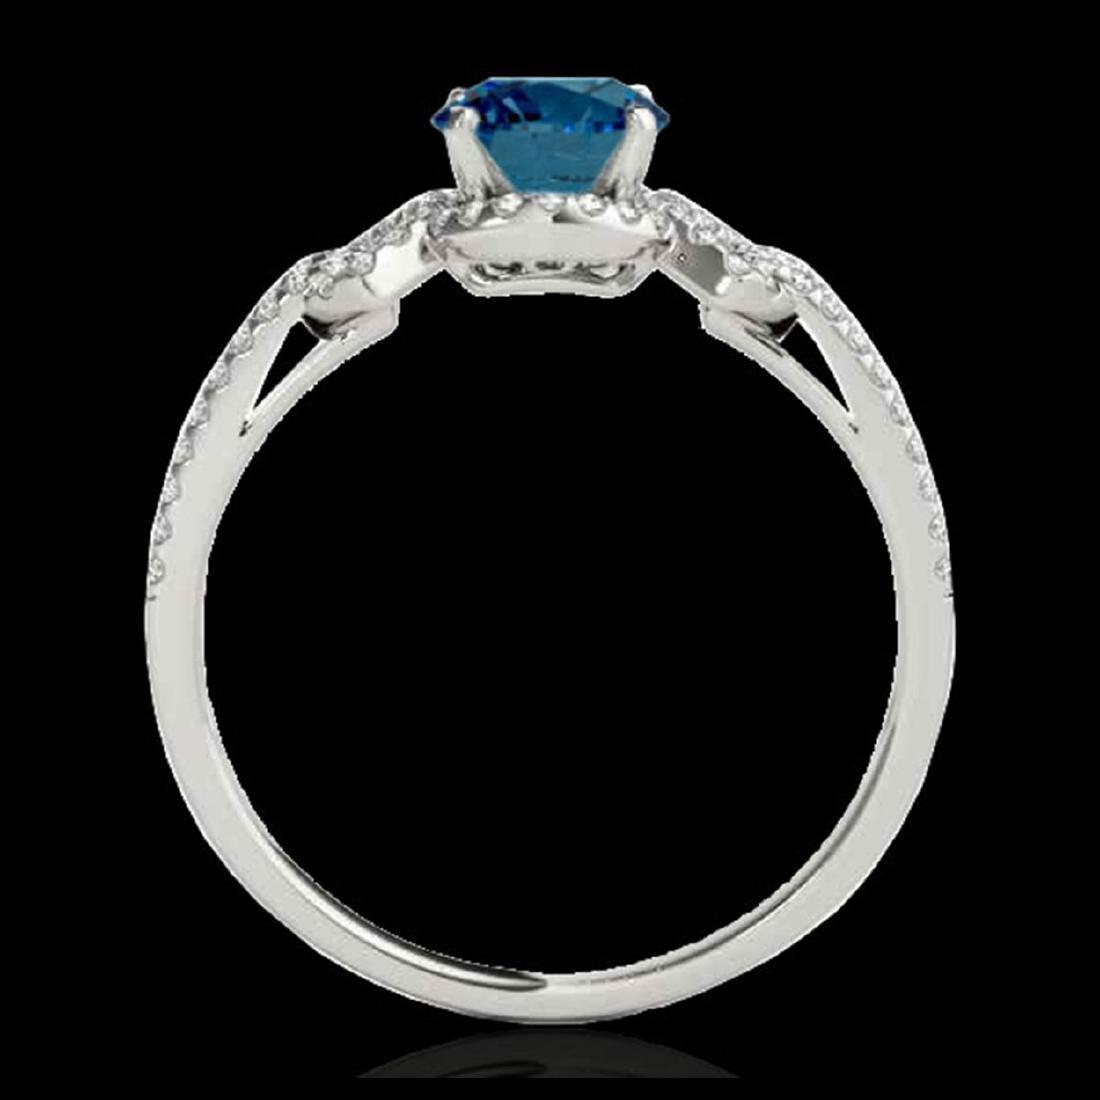 1.36 ctw SI Fancy Blue Diamond Solitaire Ring 10K White - 2